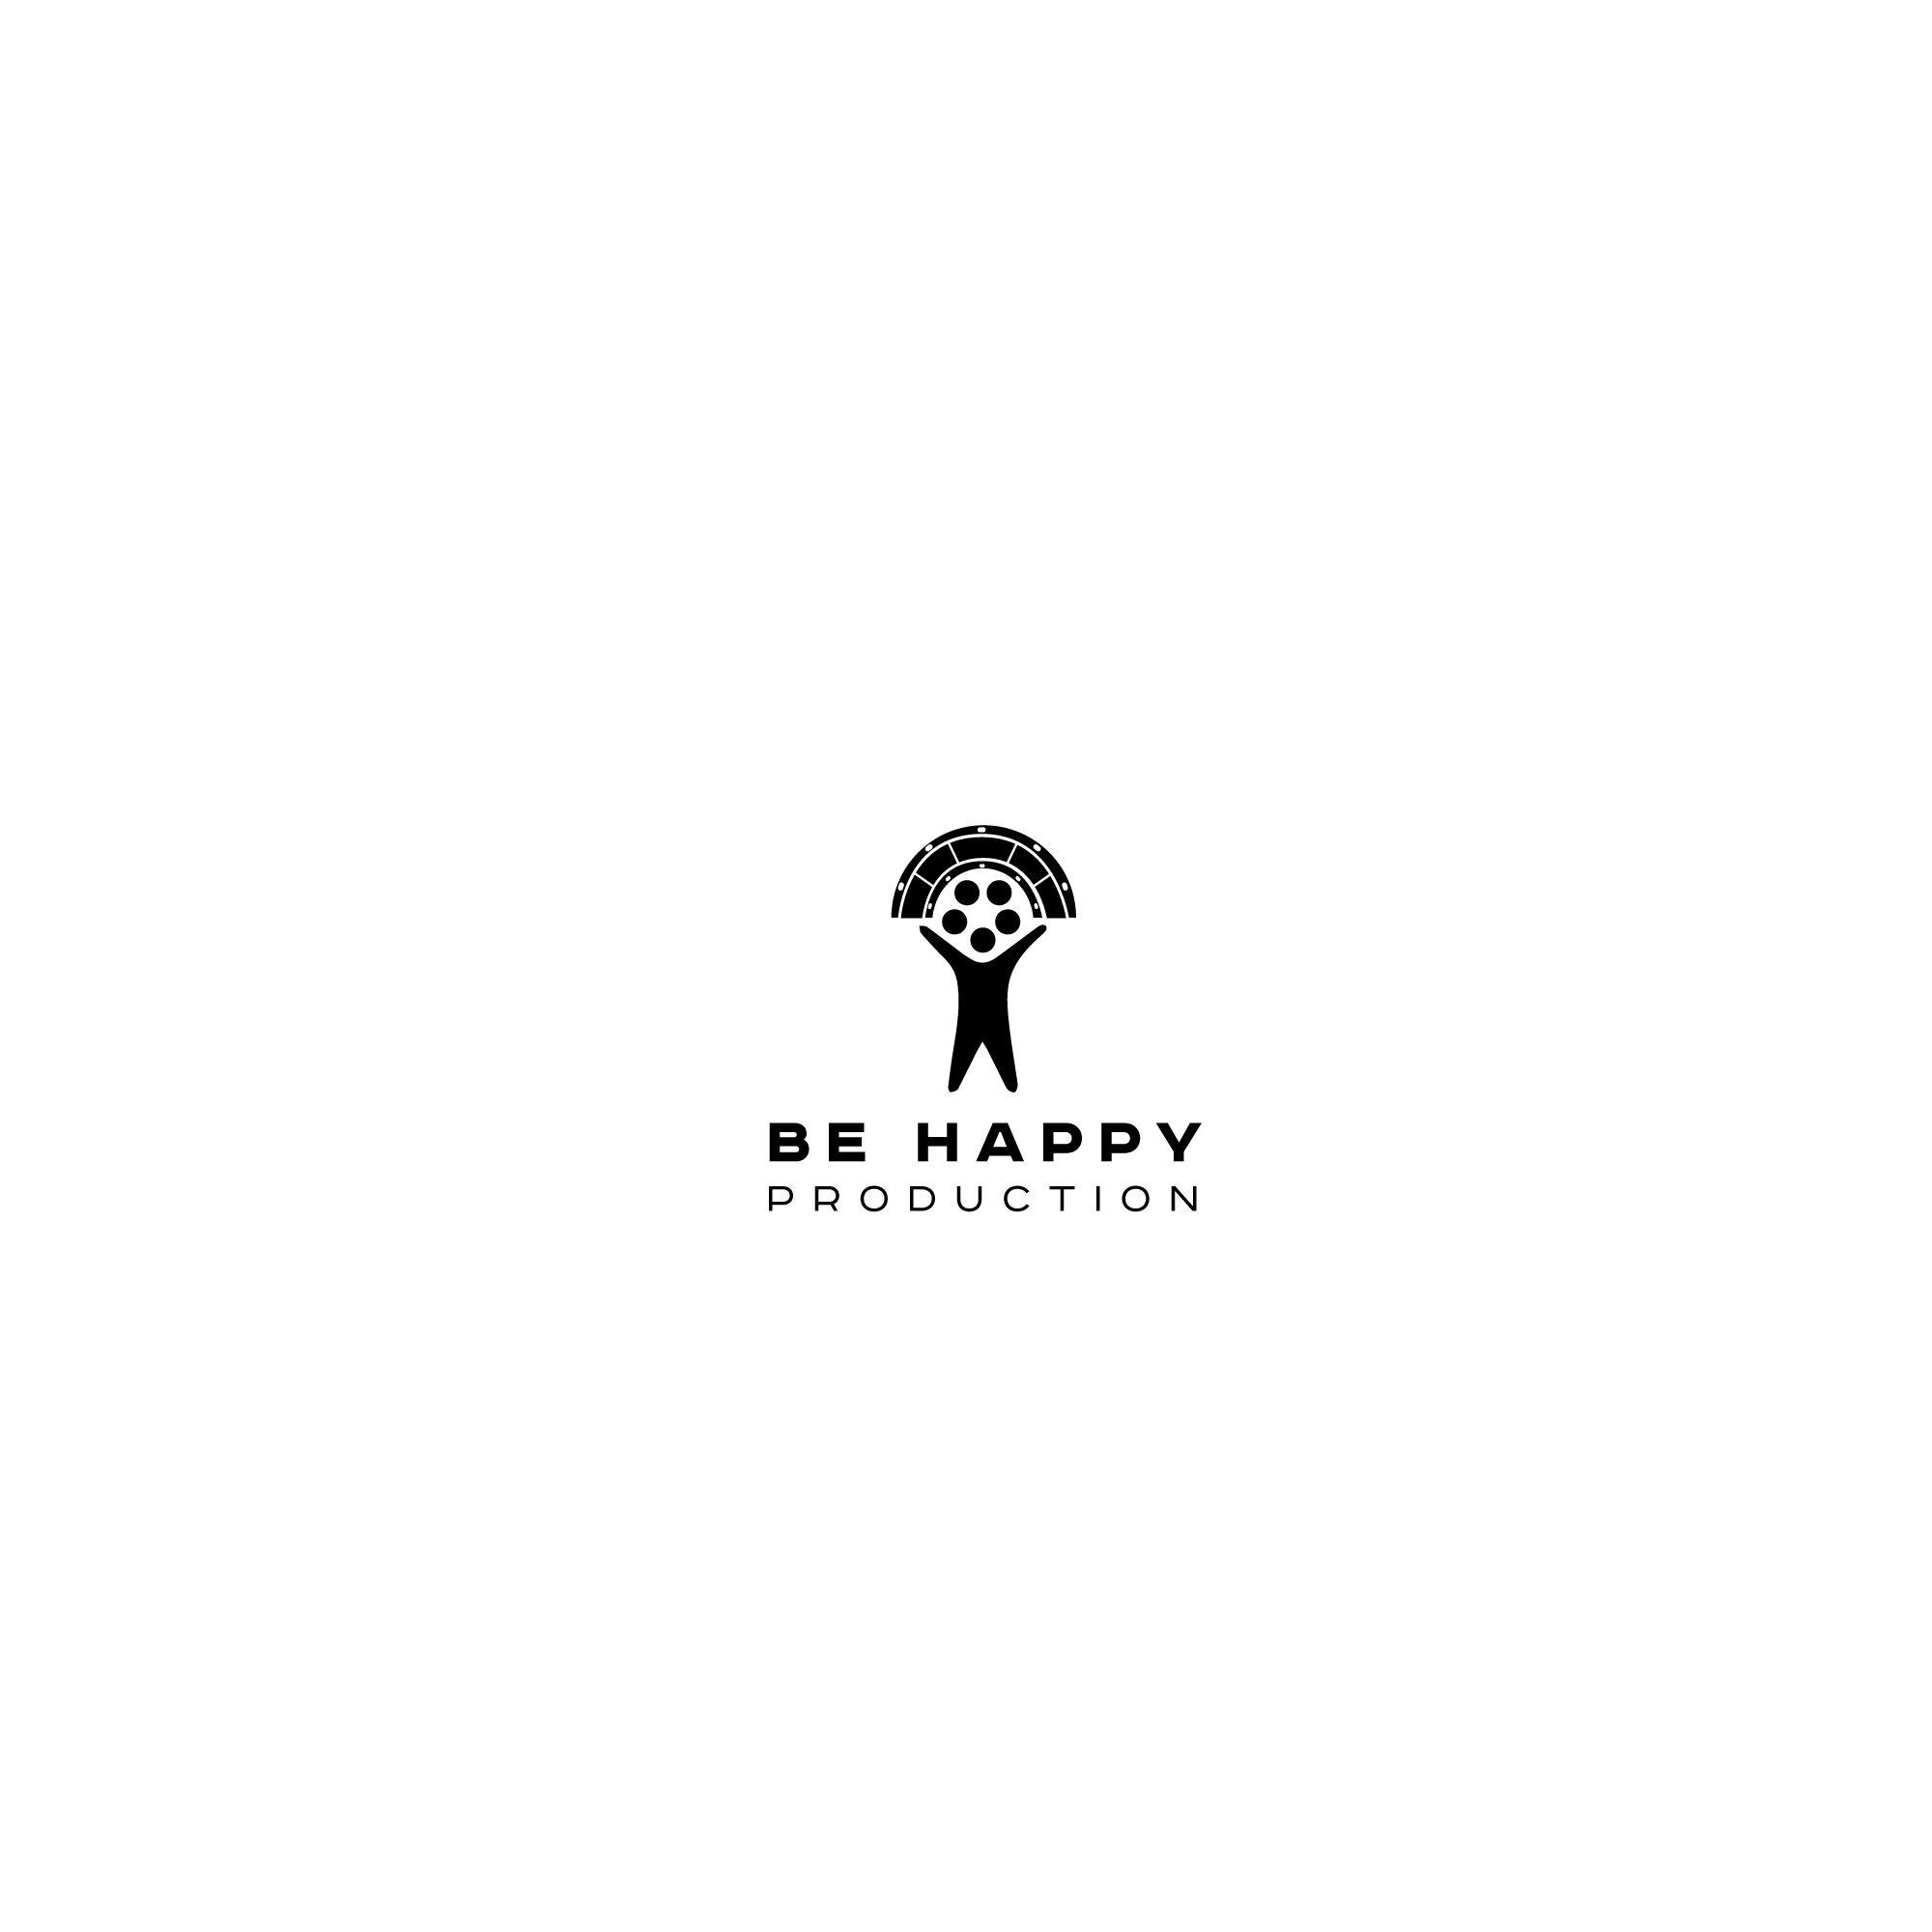 Логотип для Be Happy Production  - дизайнер SmolinDenis